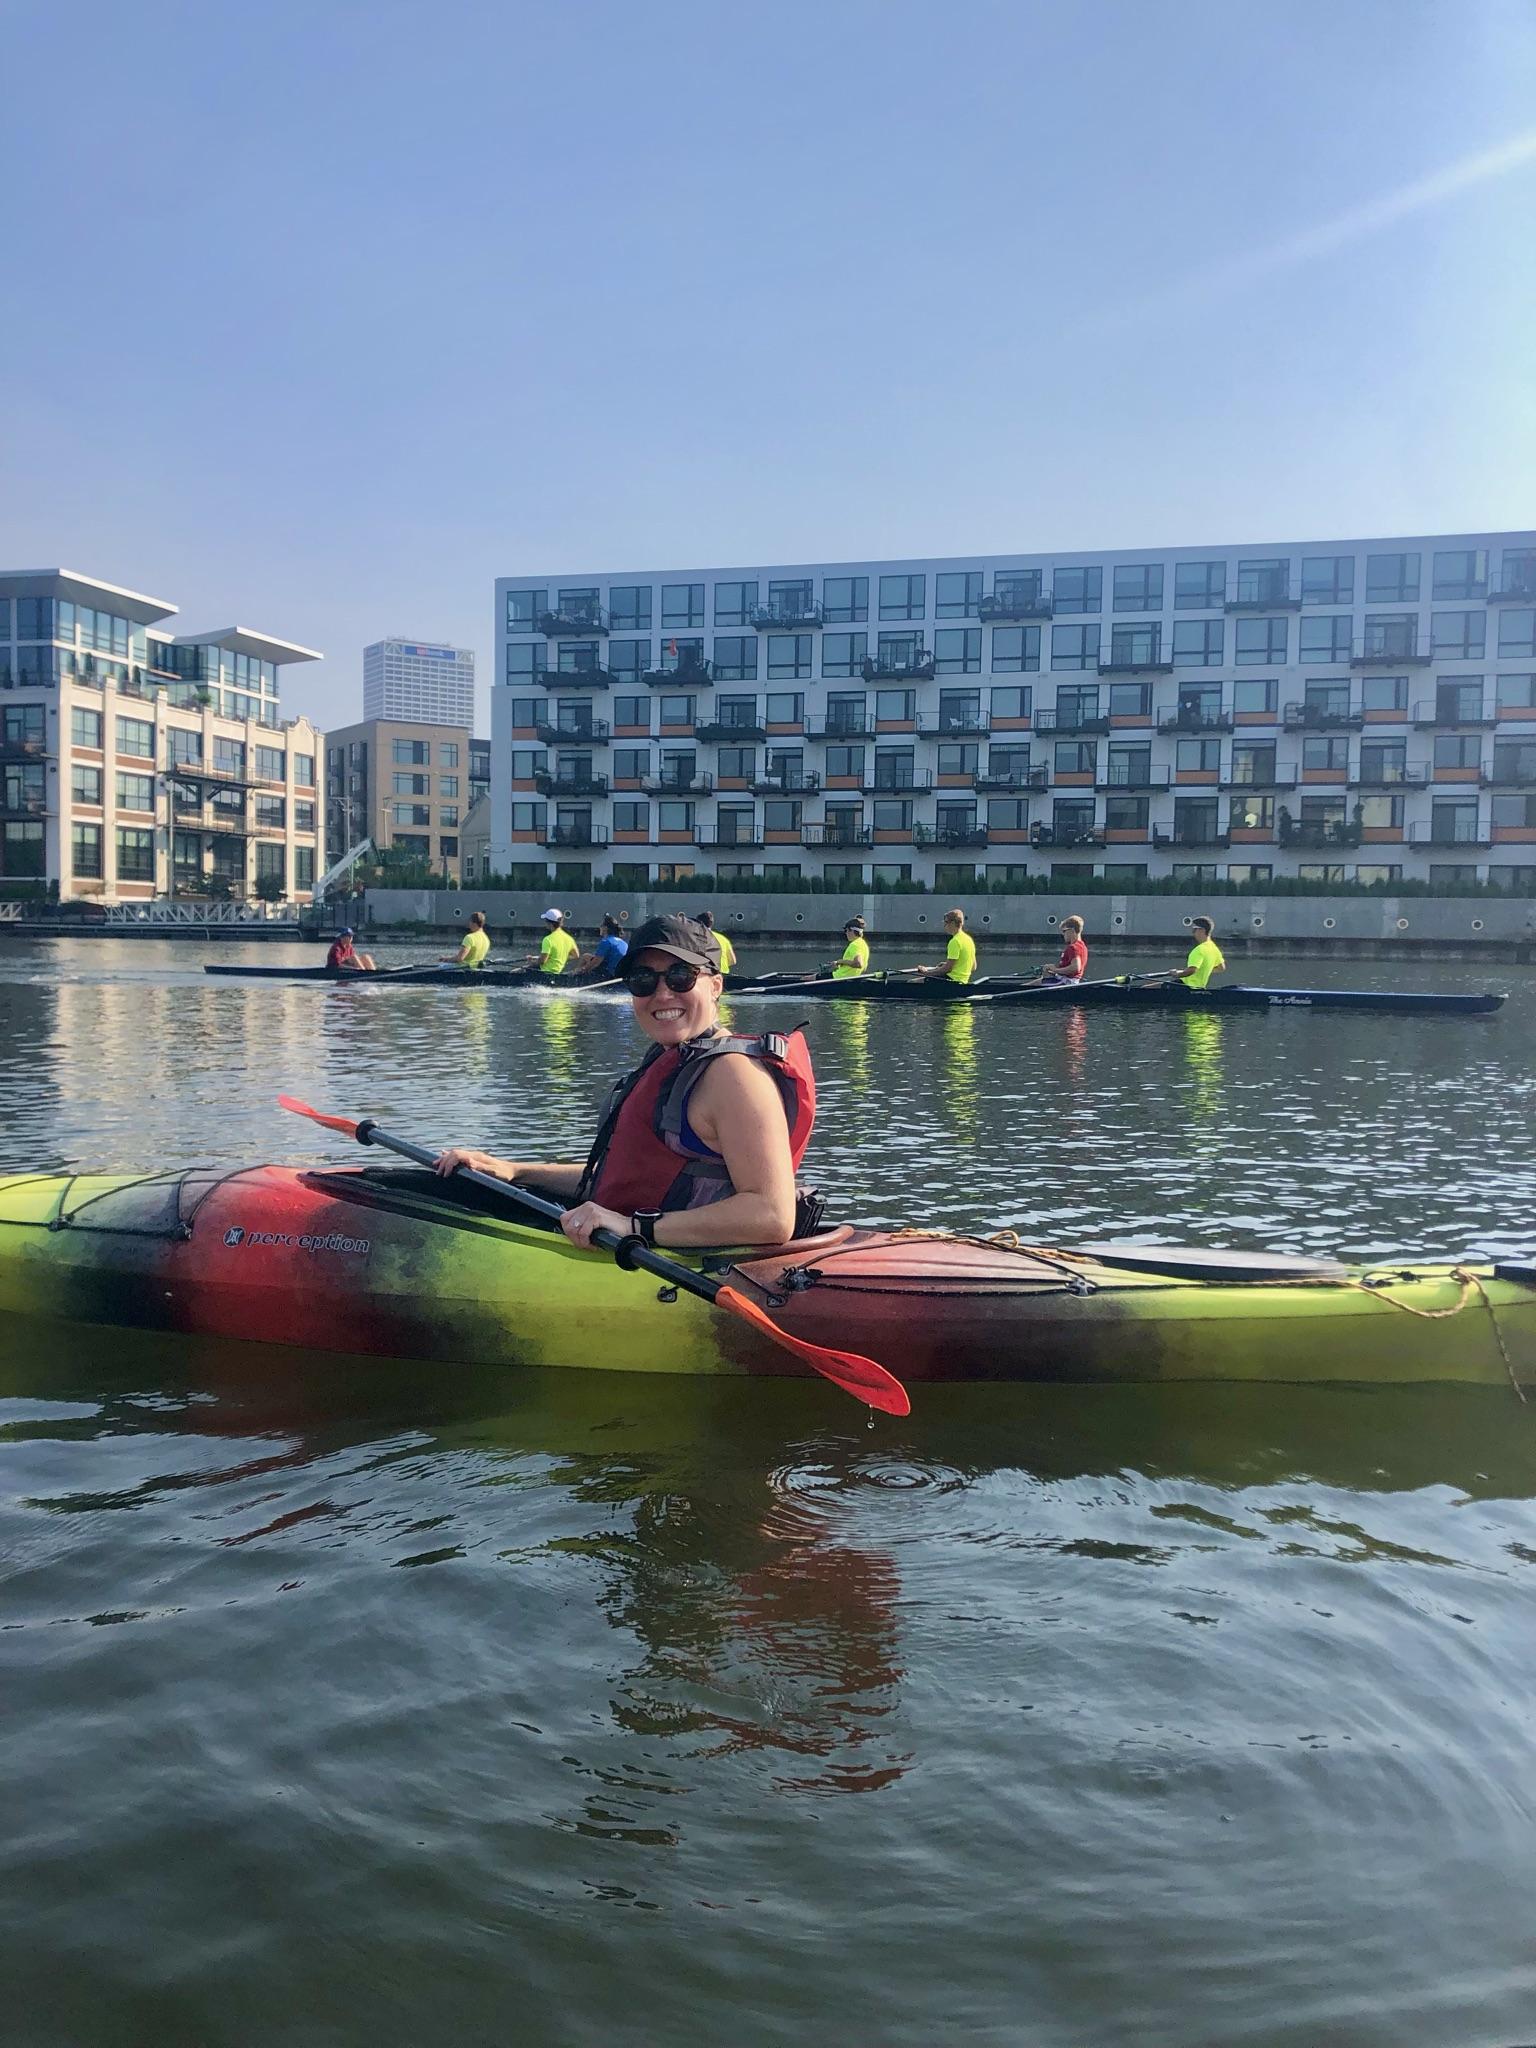 Kayaking on the Milwaukee River